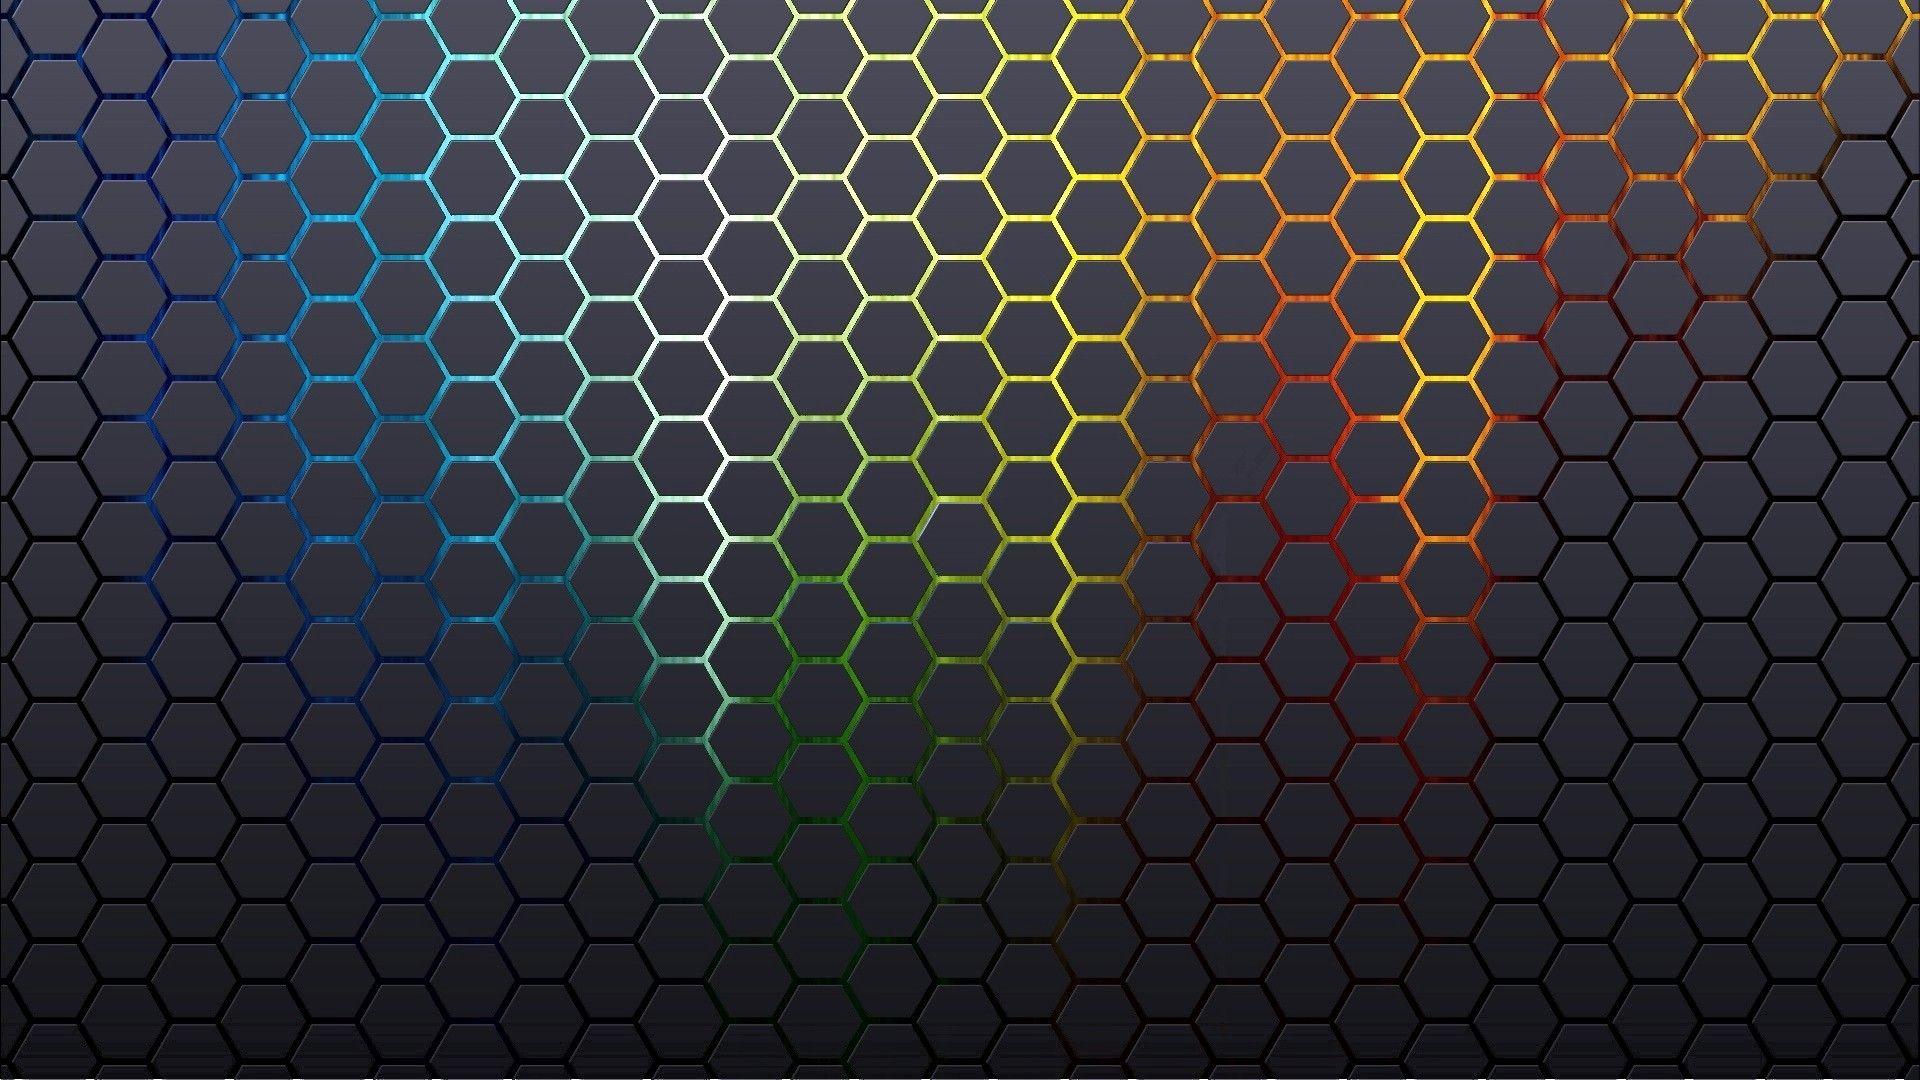 Wallpapers Patterns Minimalistic Abstract Honeycomb Pattern Hexagon Geometric Pattern Background Hexagon Tattoo